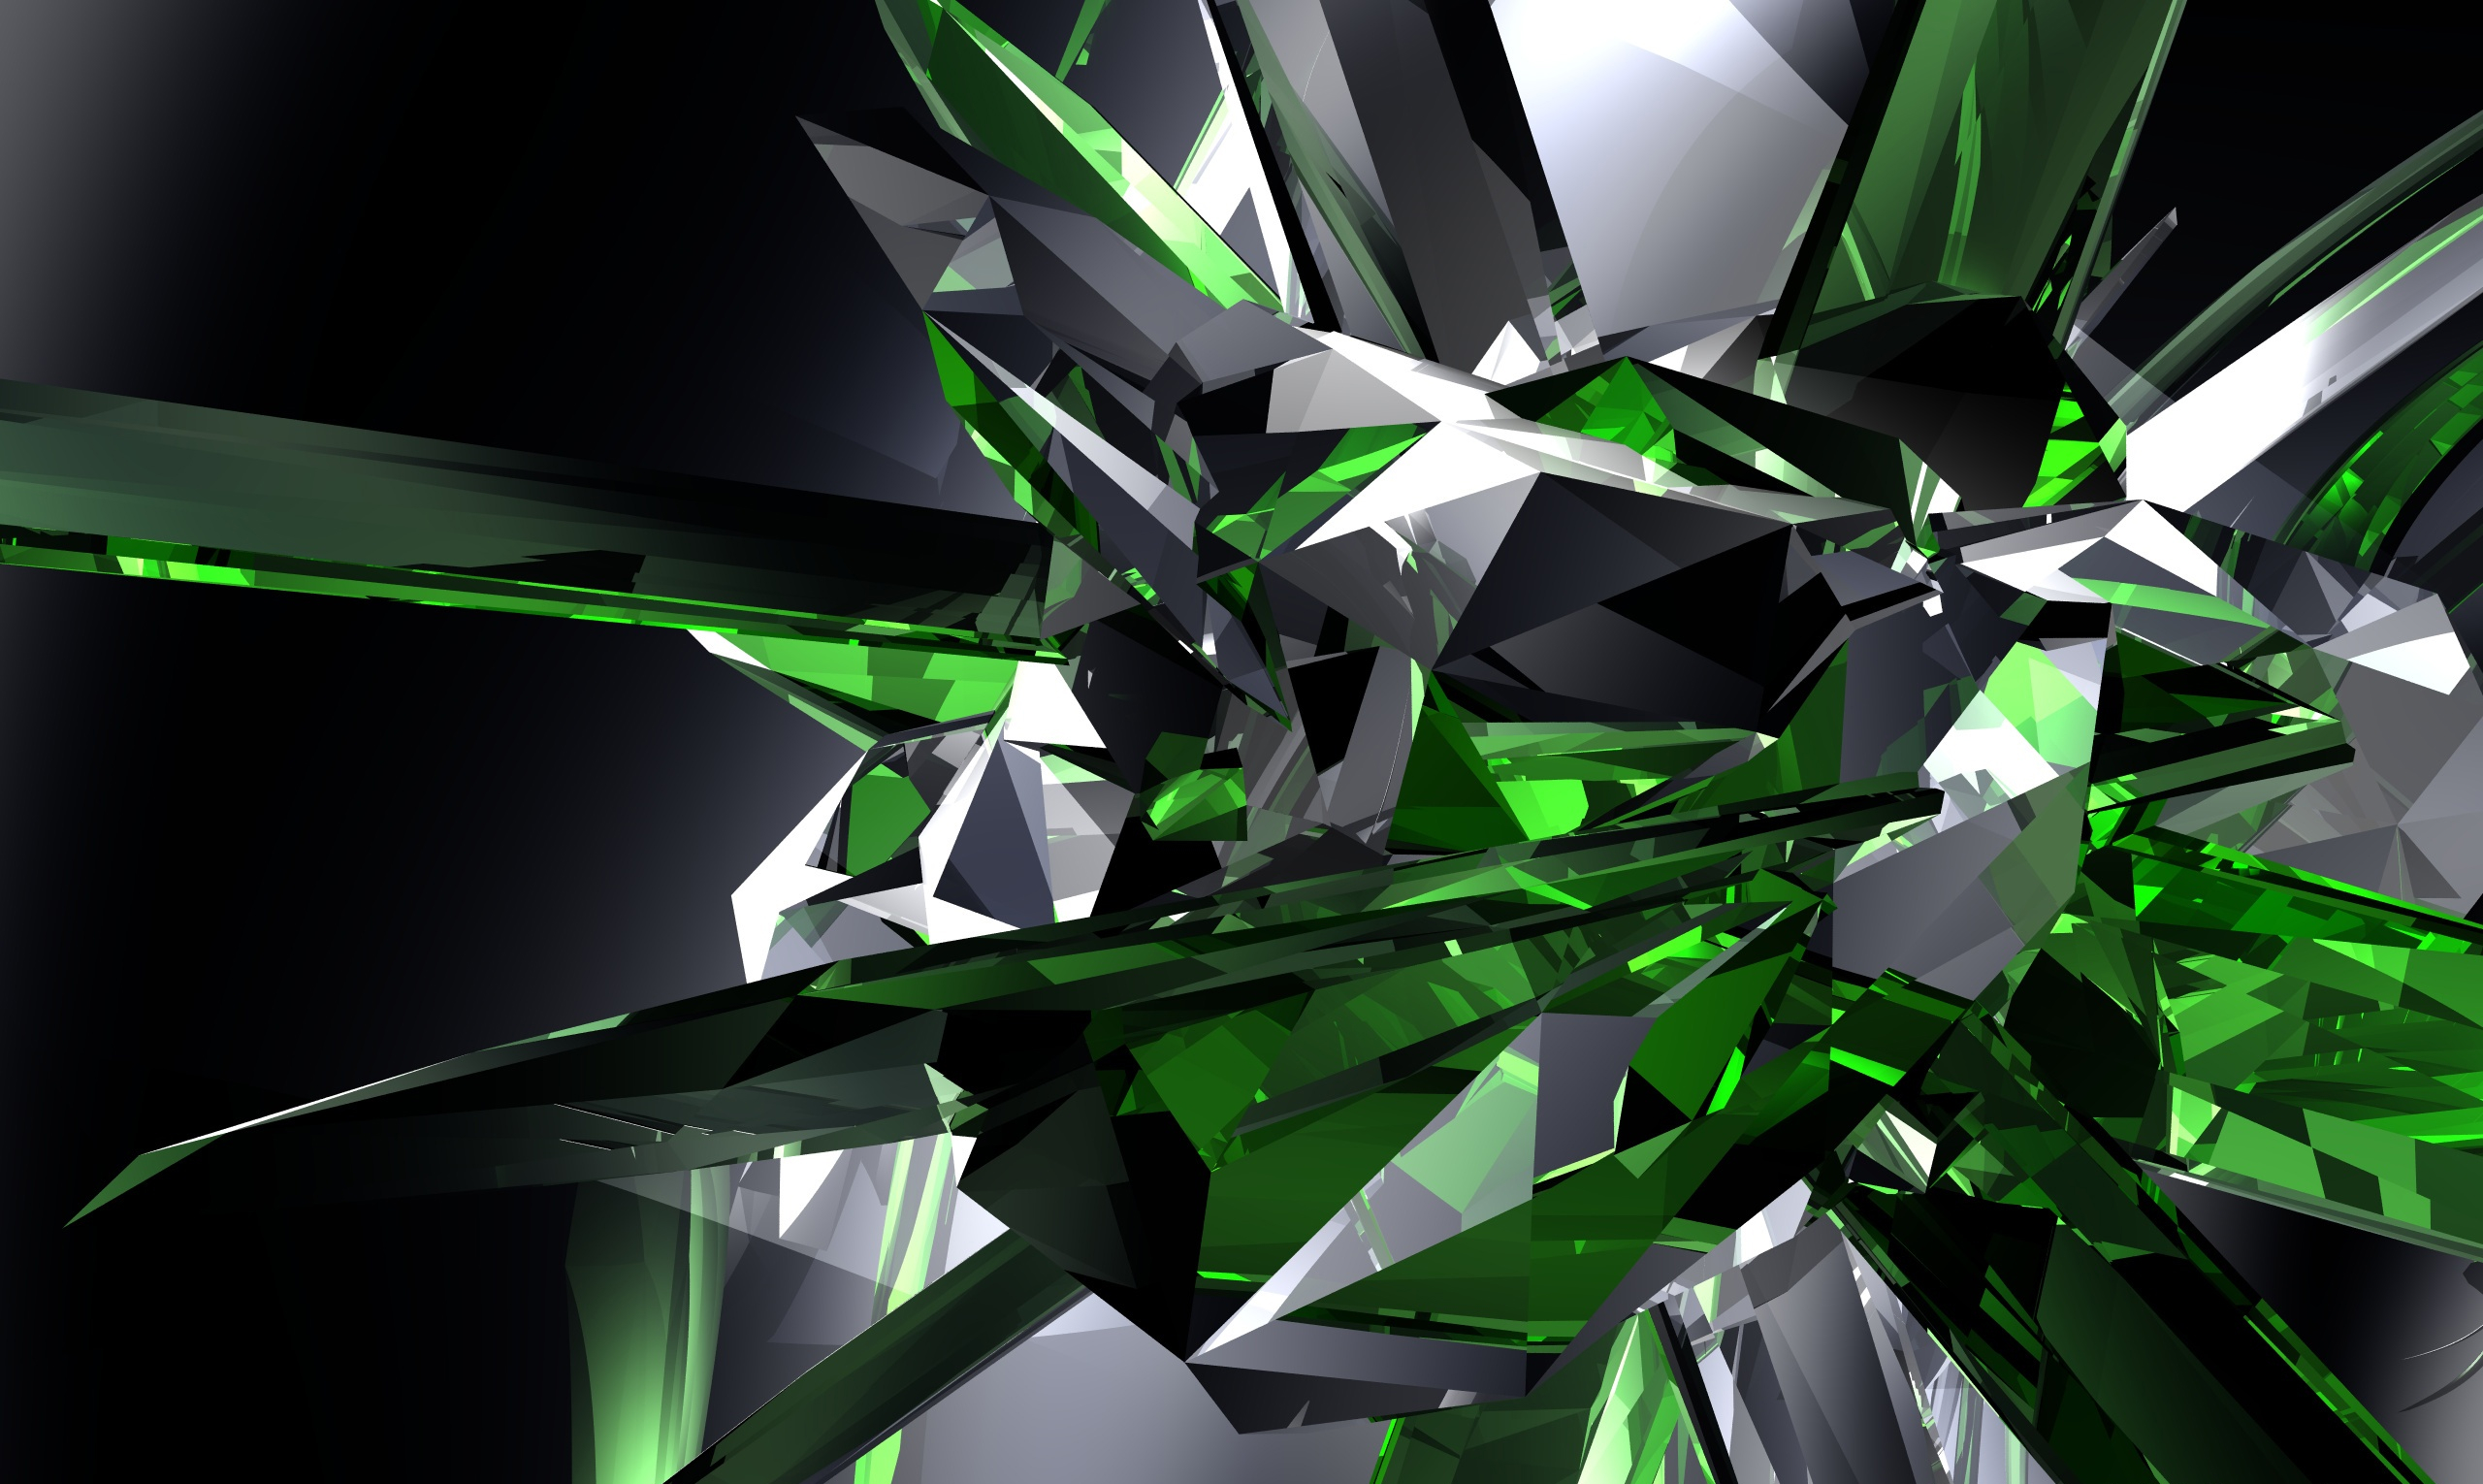 Digital Art Hd Wallpaper Background Image 2560x1530 Id 109209